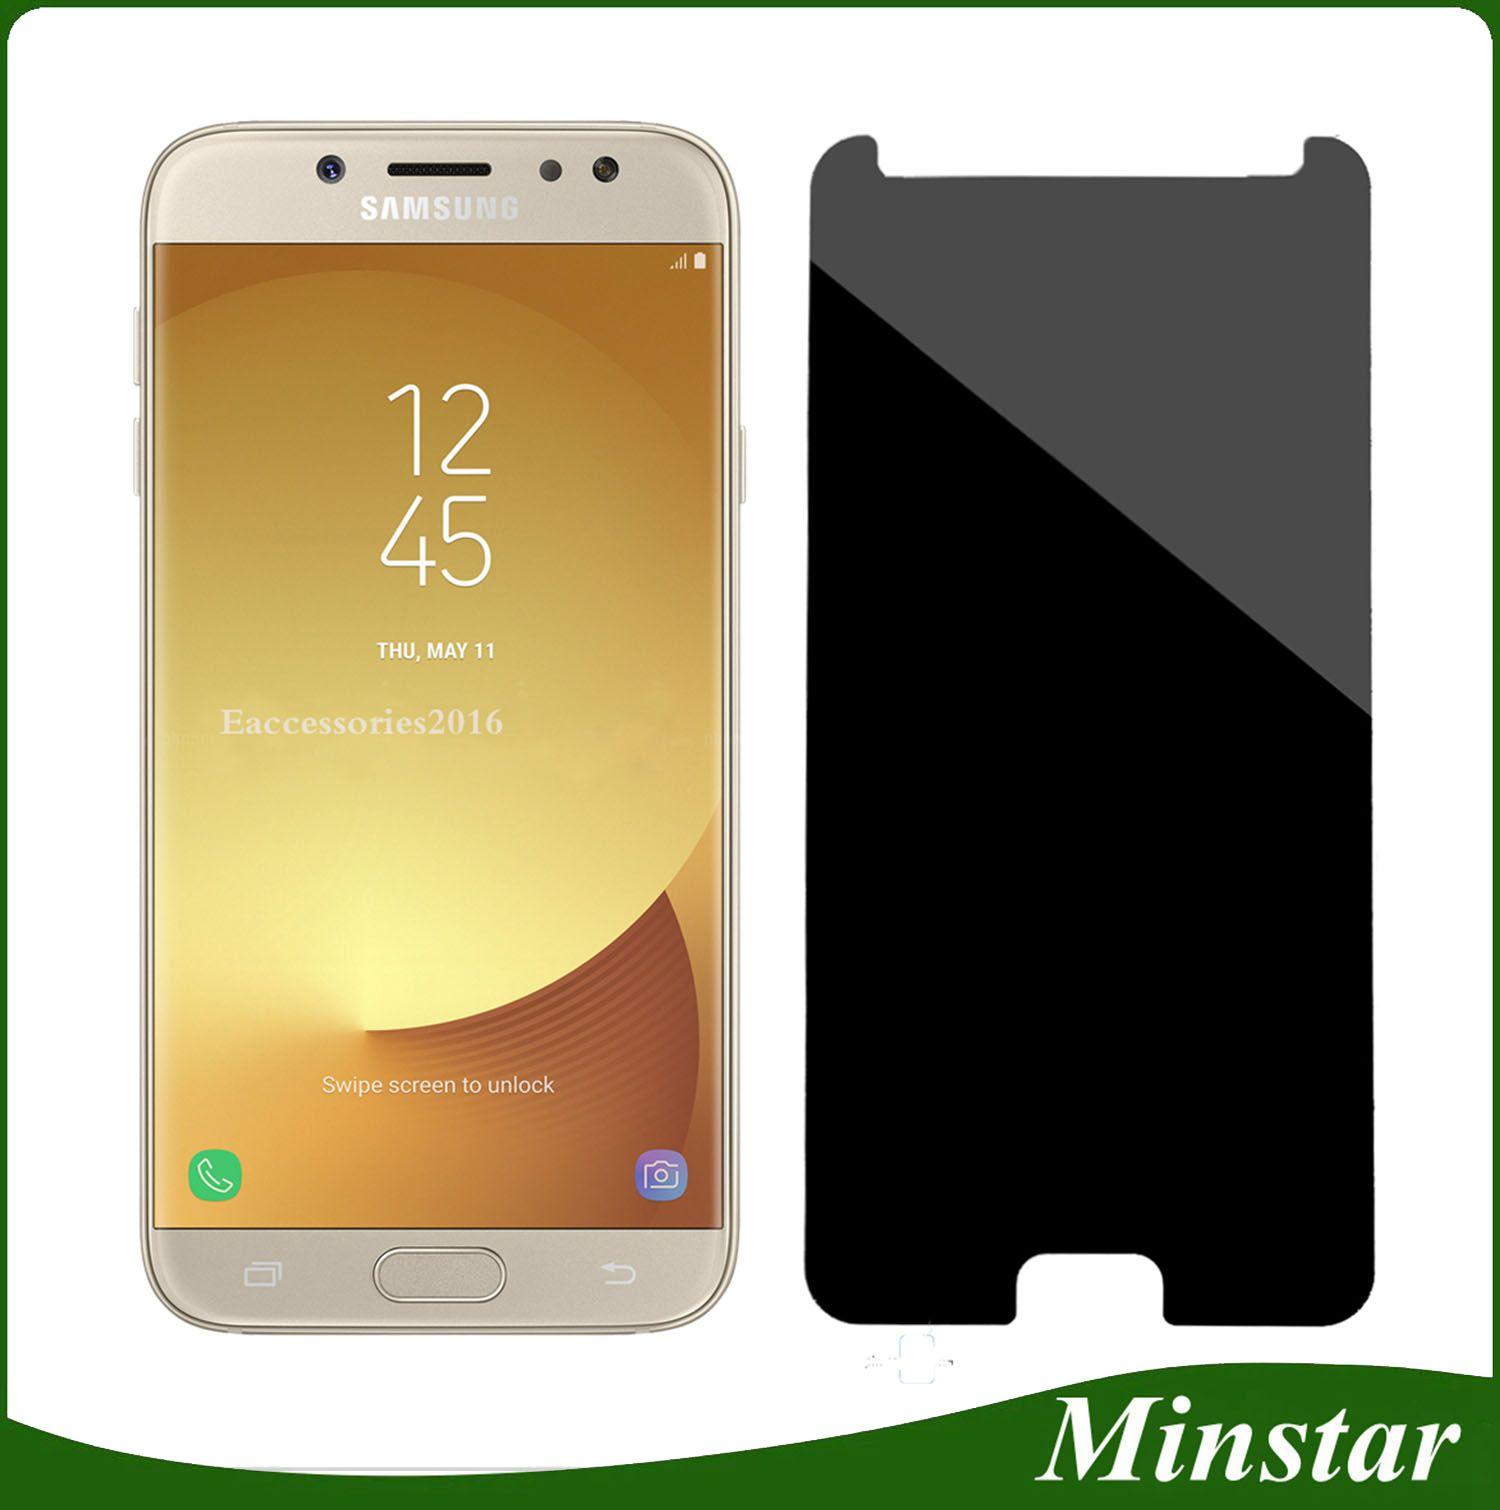 Privacy s Screen Protector Anti Spy Black Tempered Glass For Samsung J2 Pro J3pro J5 Pro J7pro Galaxy J3 2018 J337 J7 2018 J737 Cell Phone Protector e